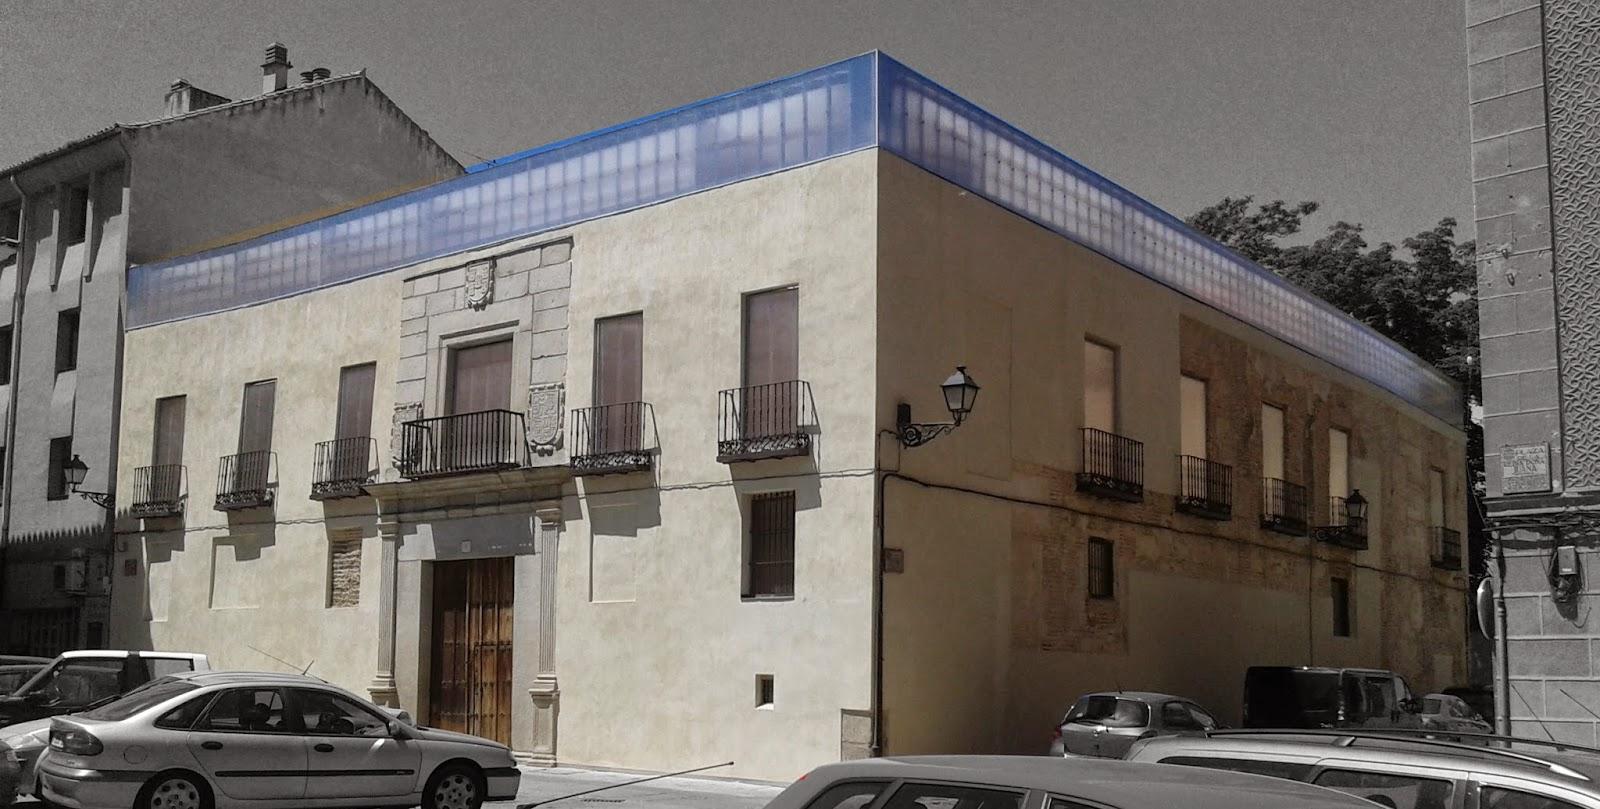 Palacio de enrique iv segovia arquitectura segovia sf23 arquitectos - Arquitectos en segovia ...